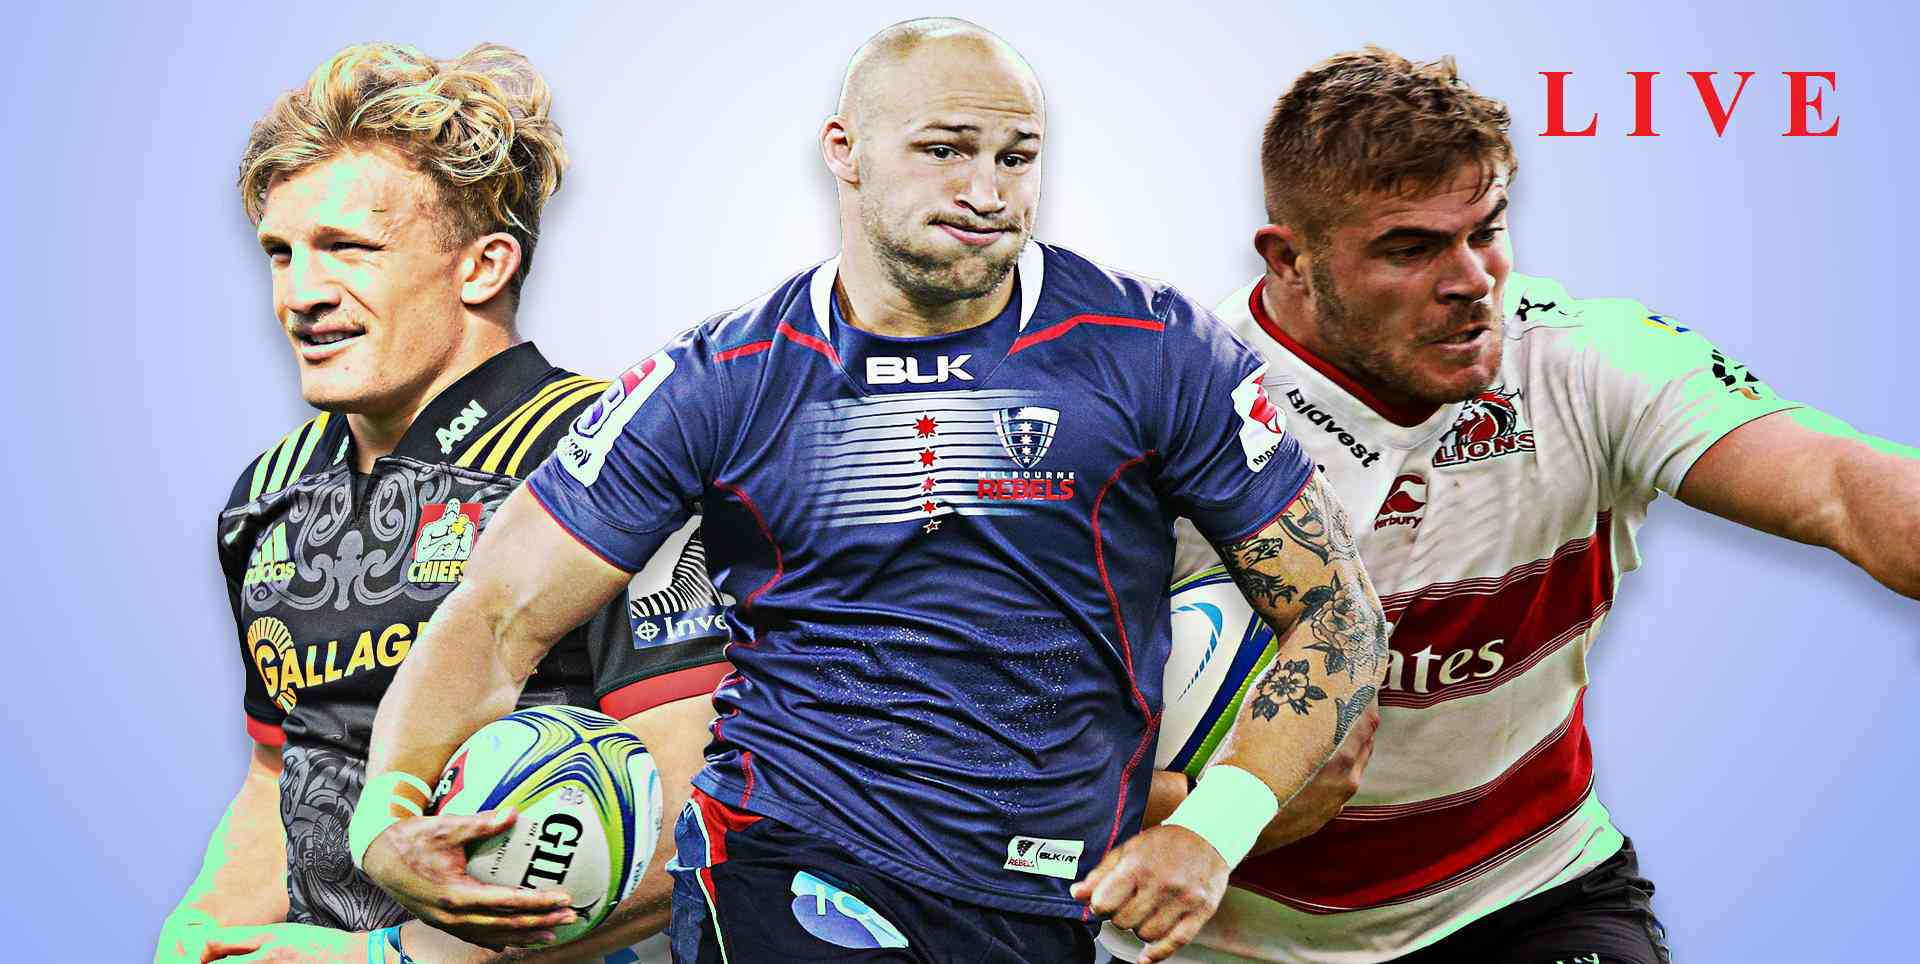 live-scarlets-vs-glasgow-rugby-online